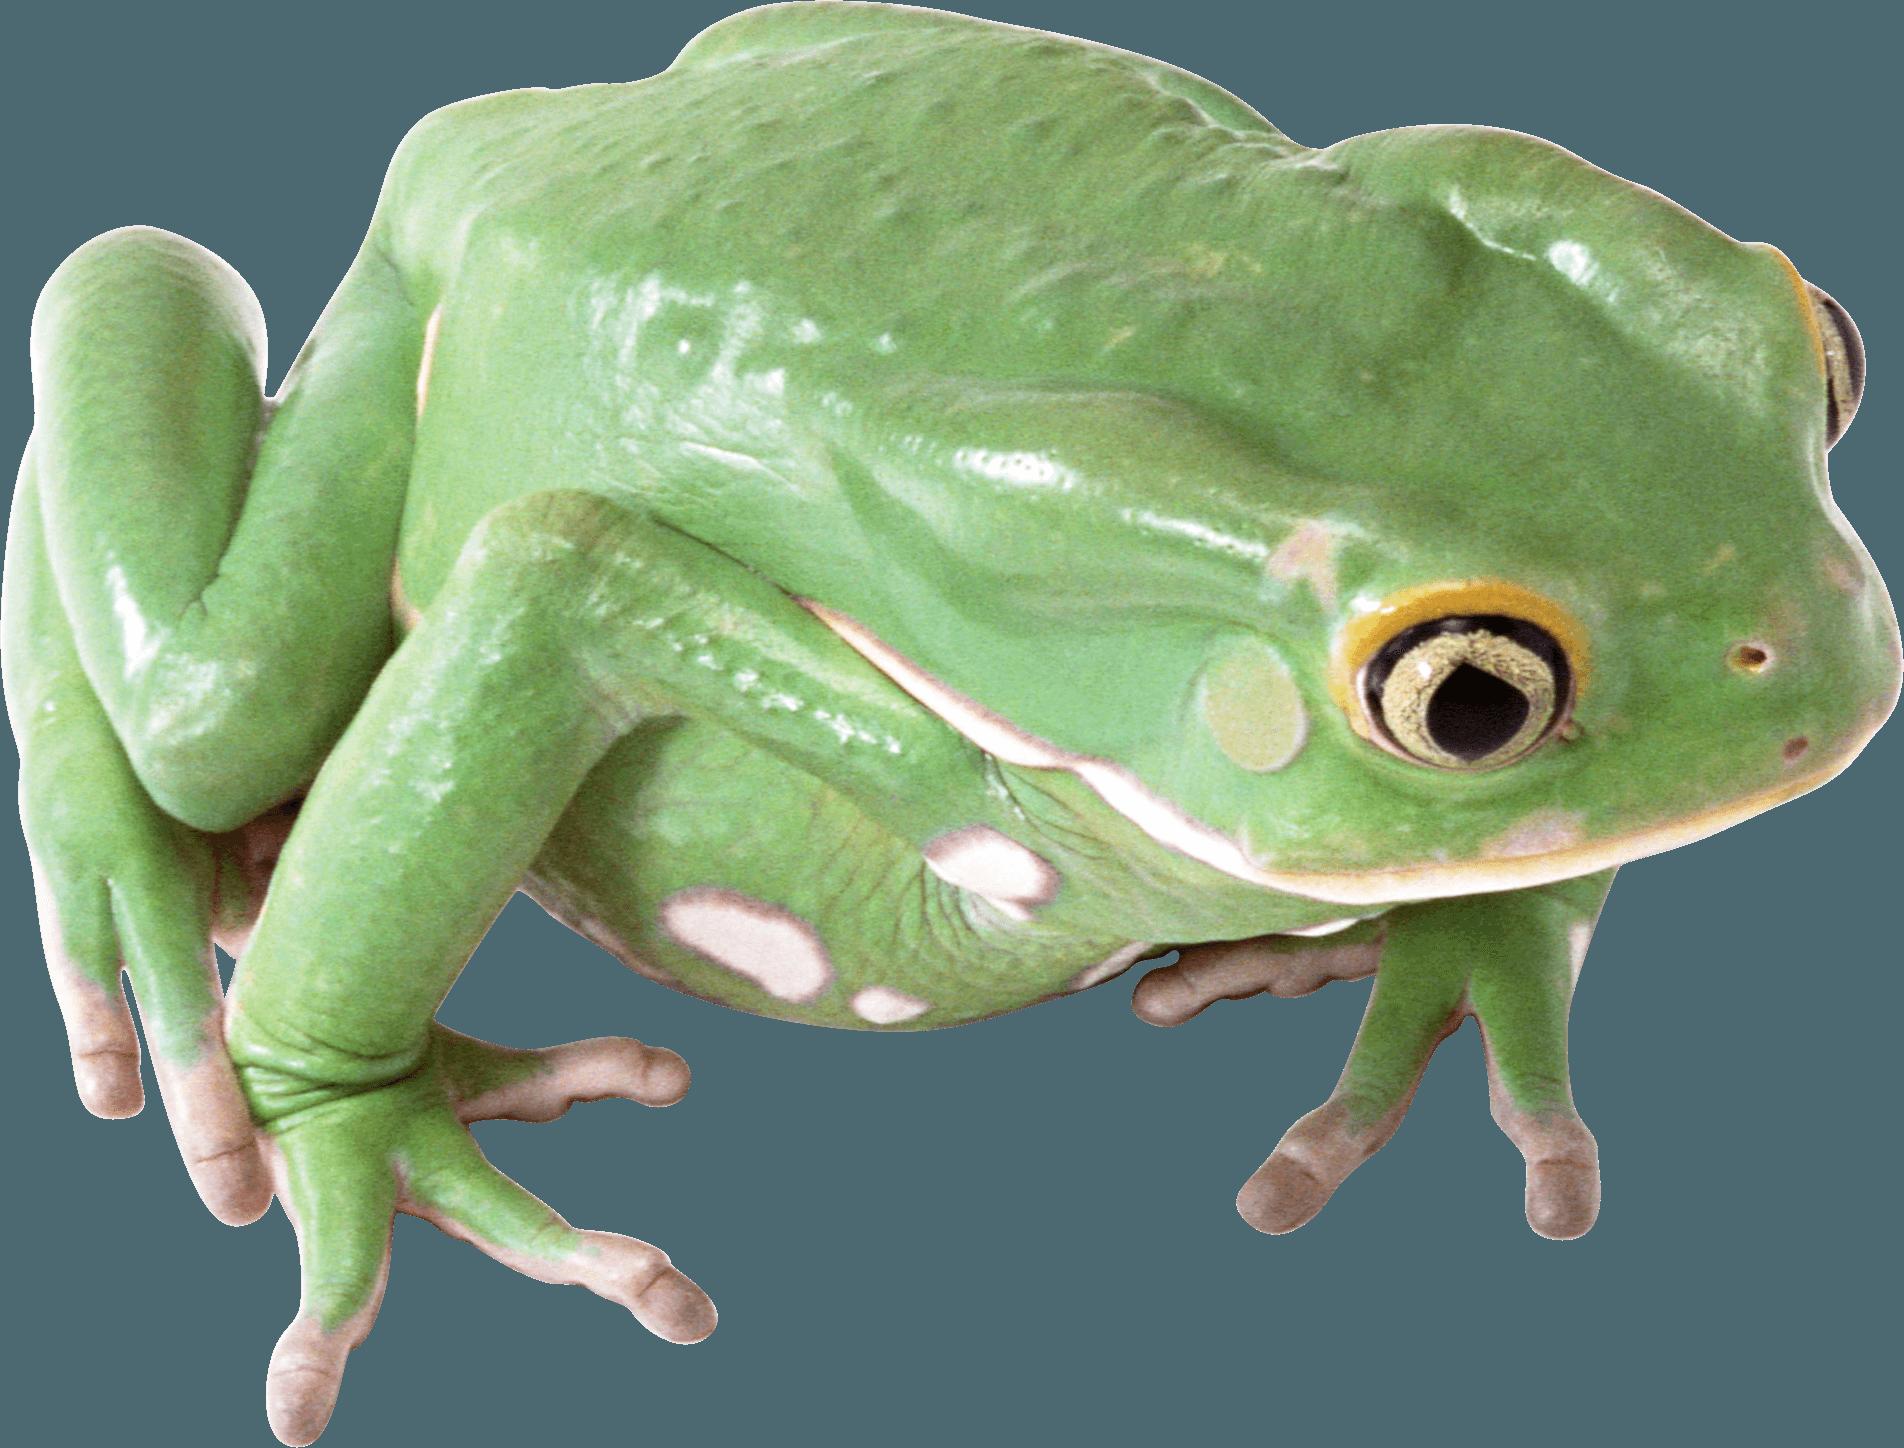 green frog PNG Image